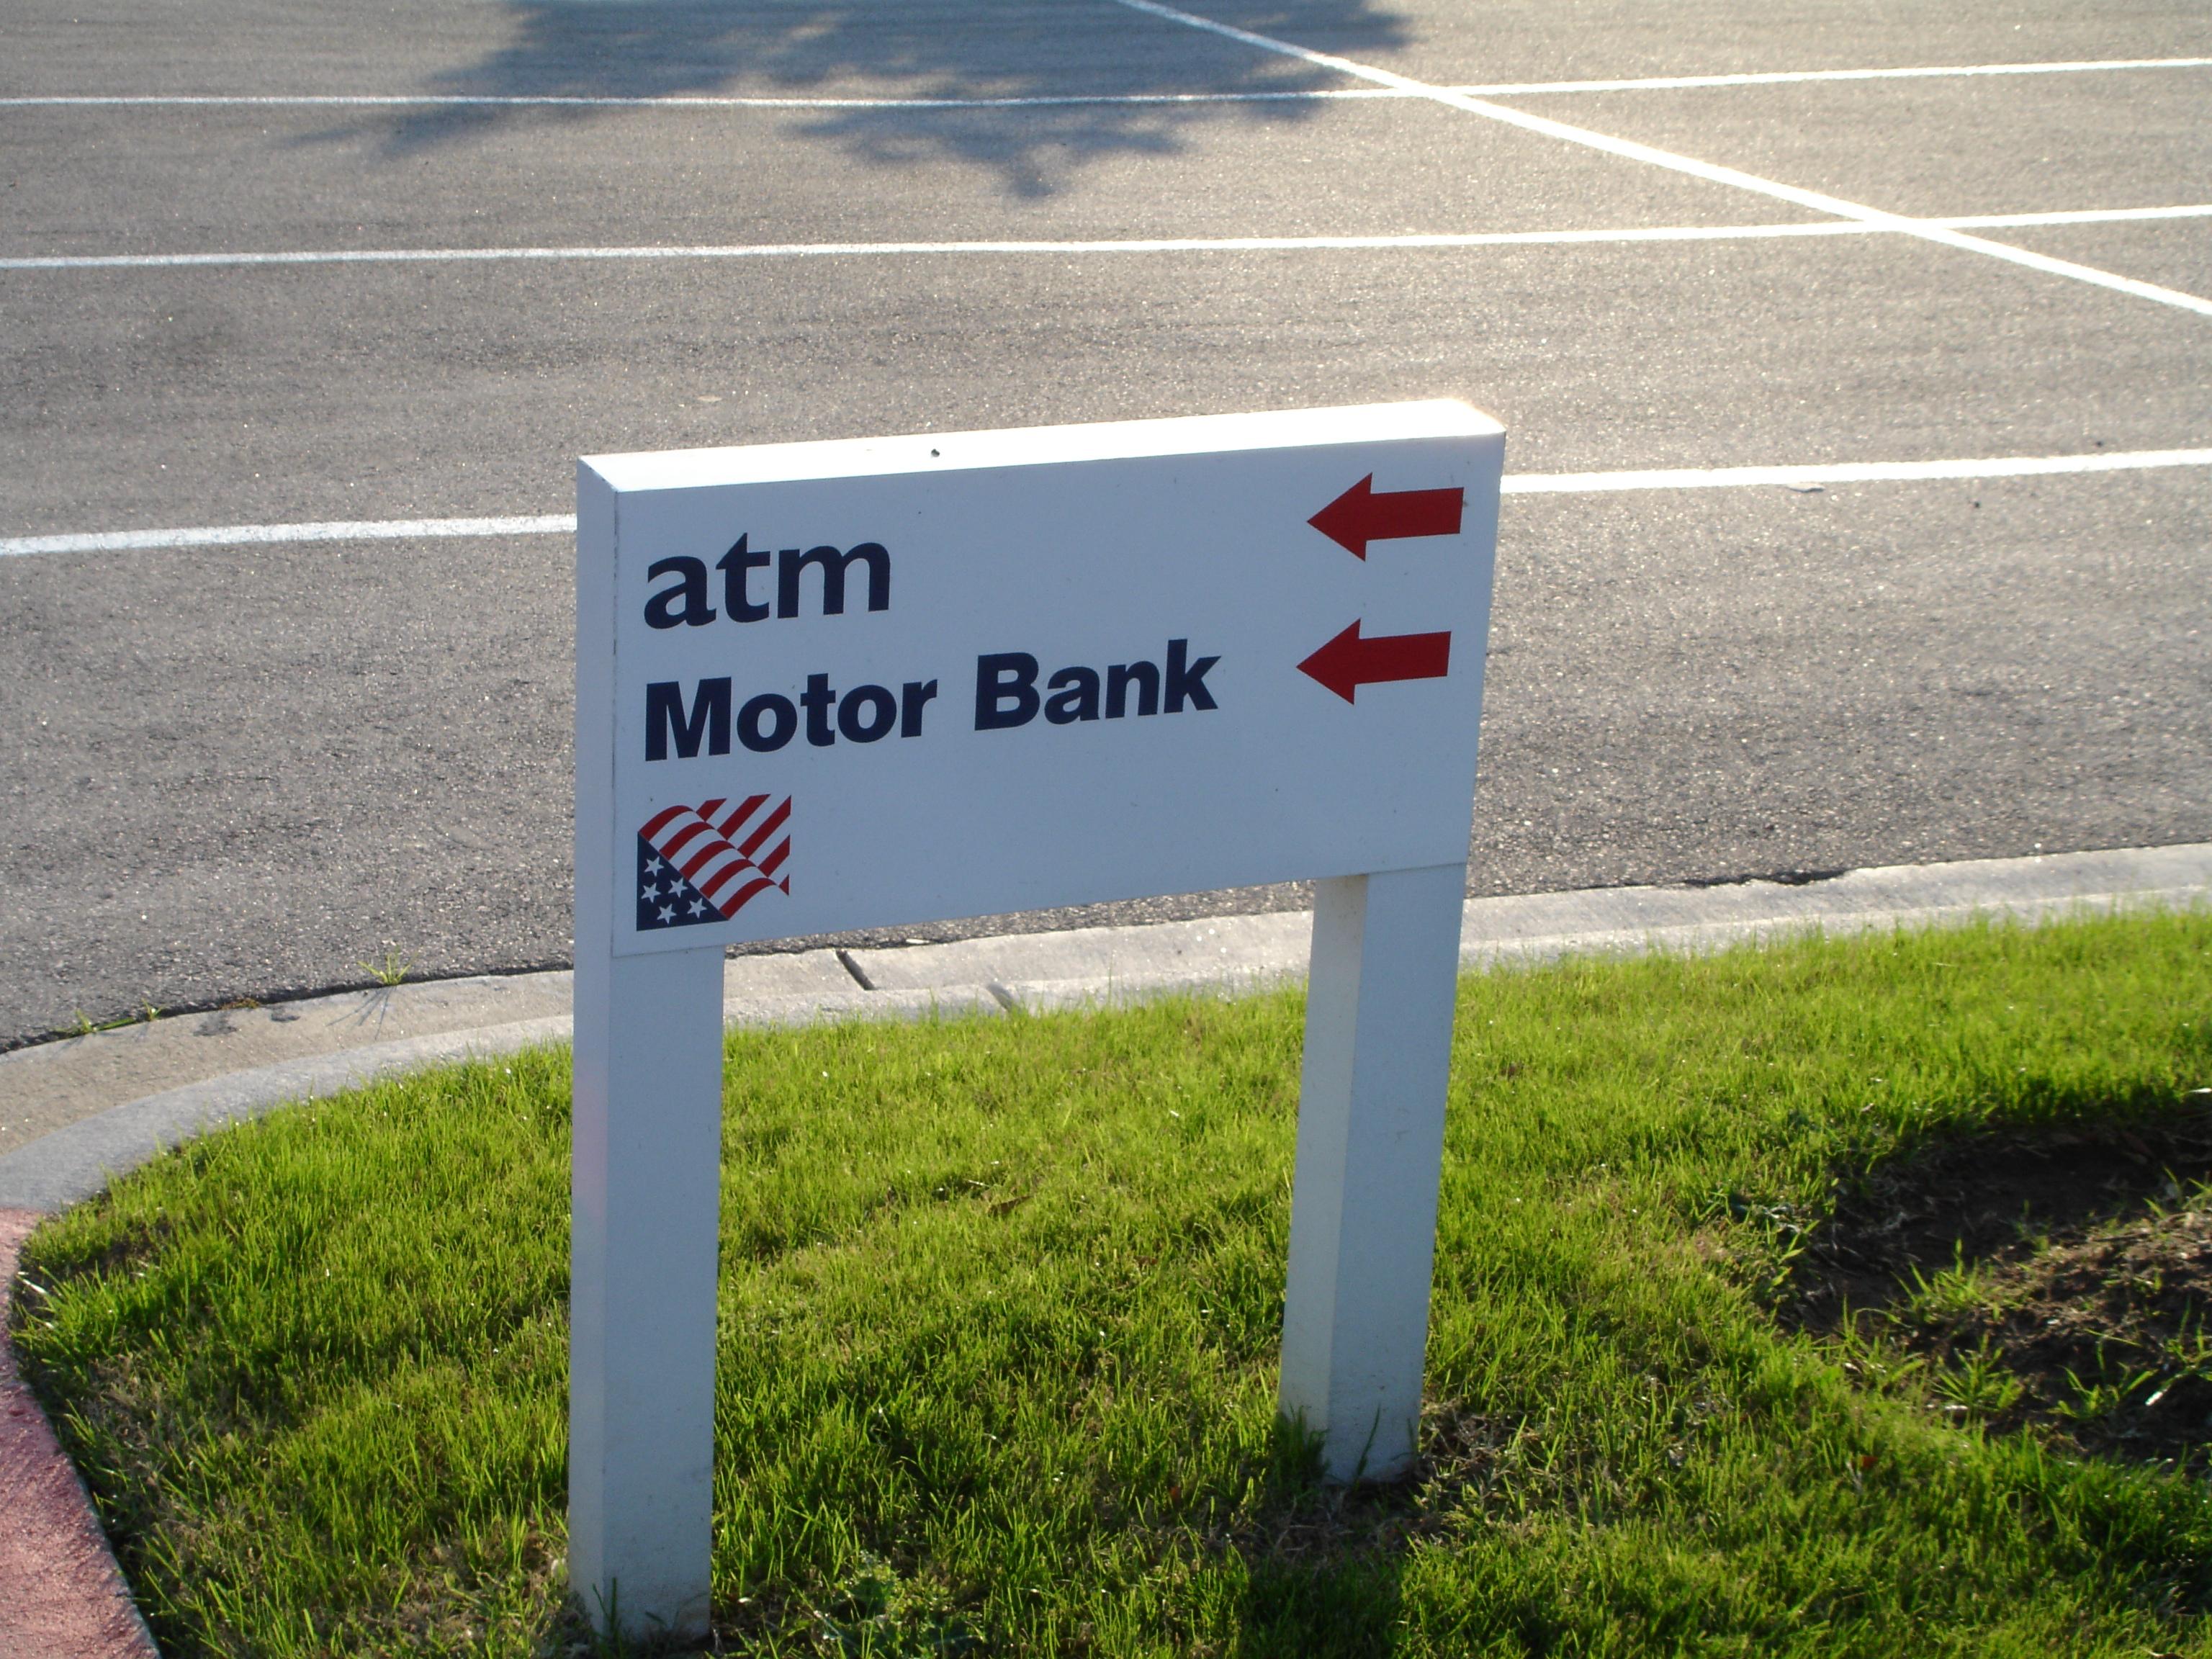 American Bank of Texas Parking Lot Directional 1.JPG